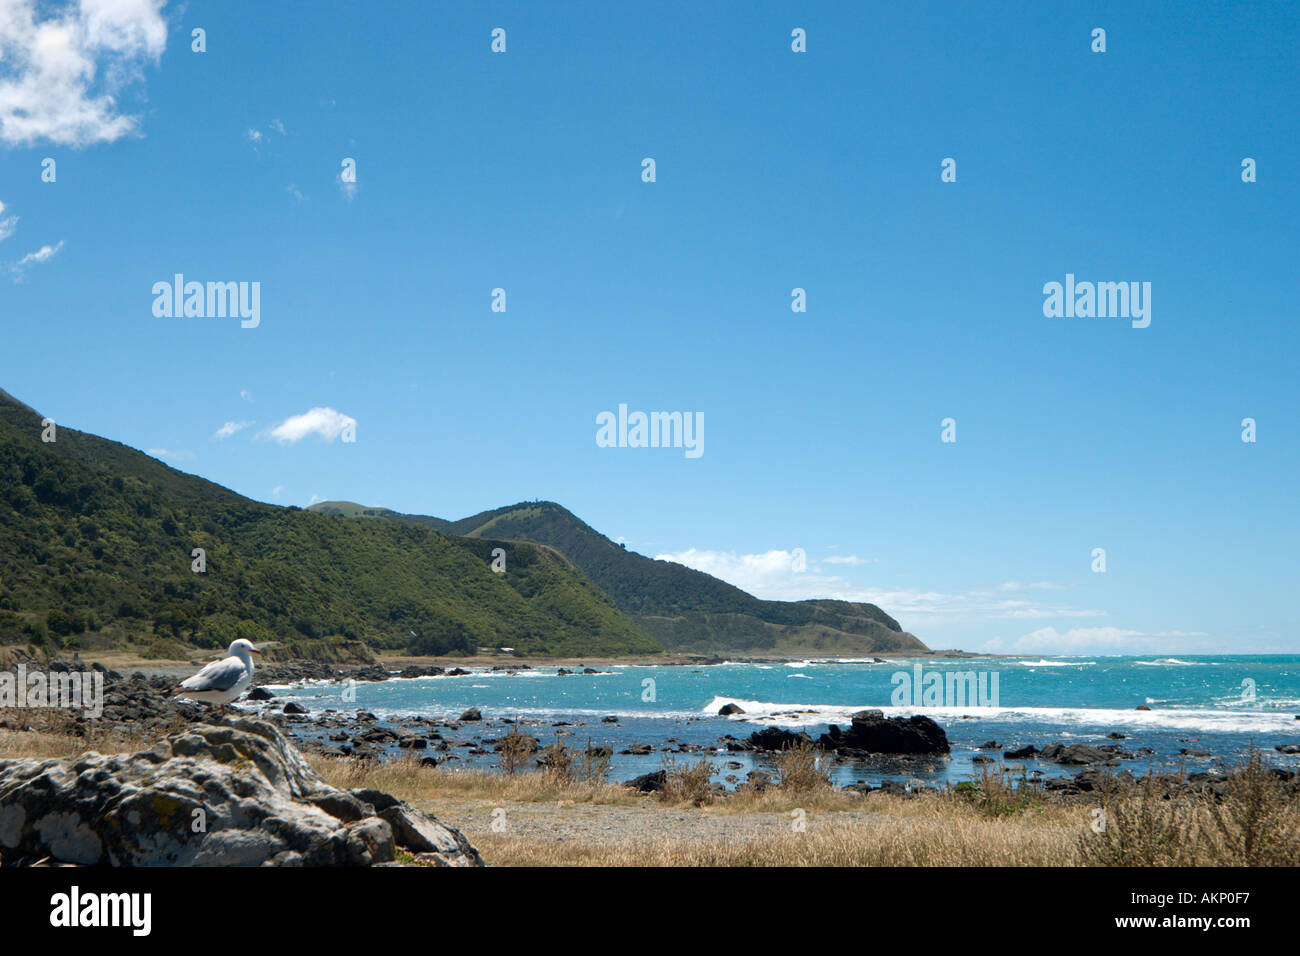 Coast on SH1 north of Kaikoura, South Island, New Zealand - Stock Image